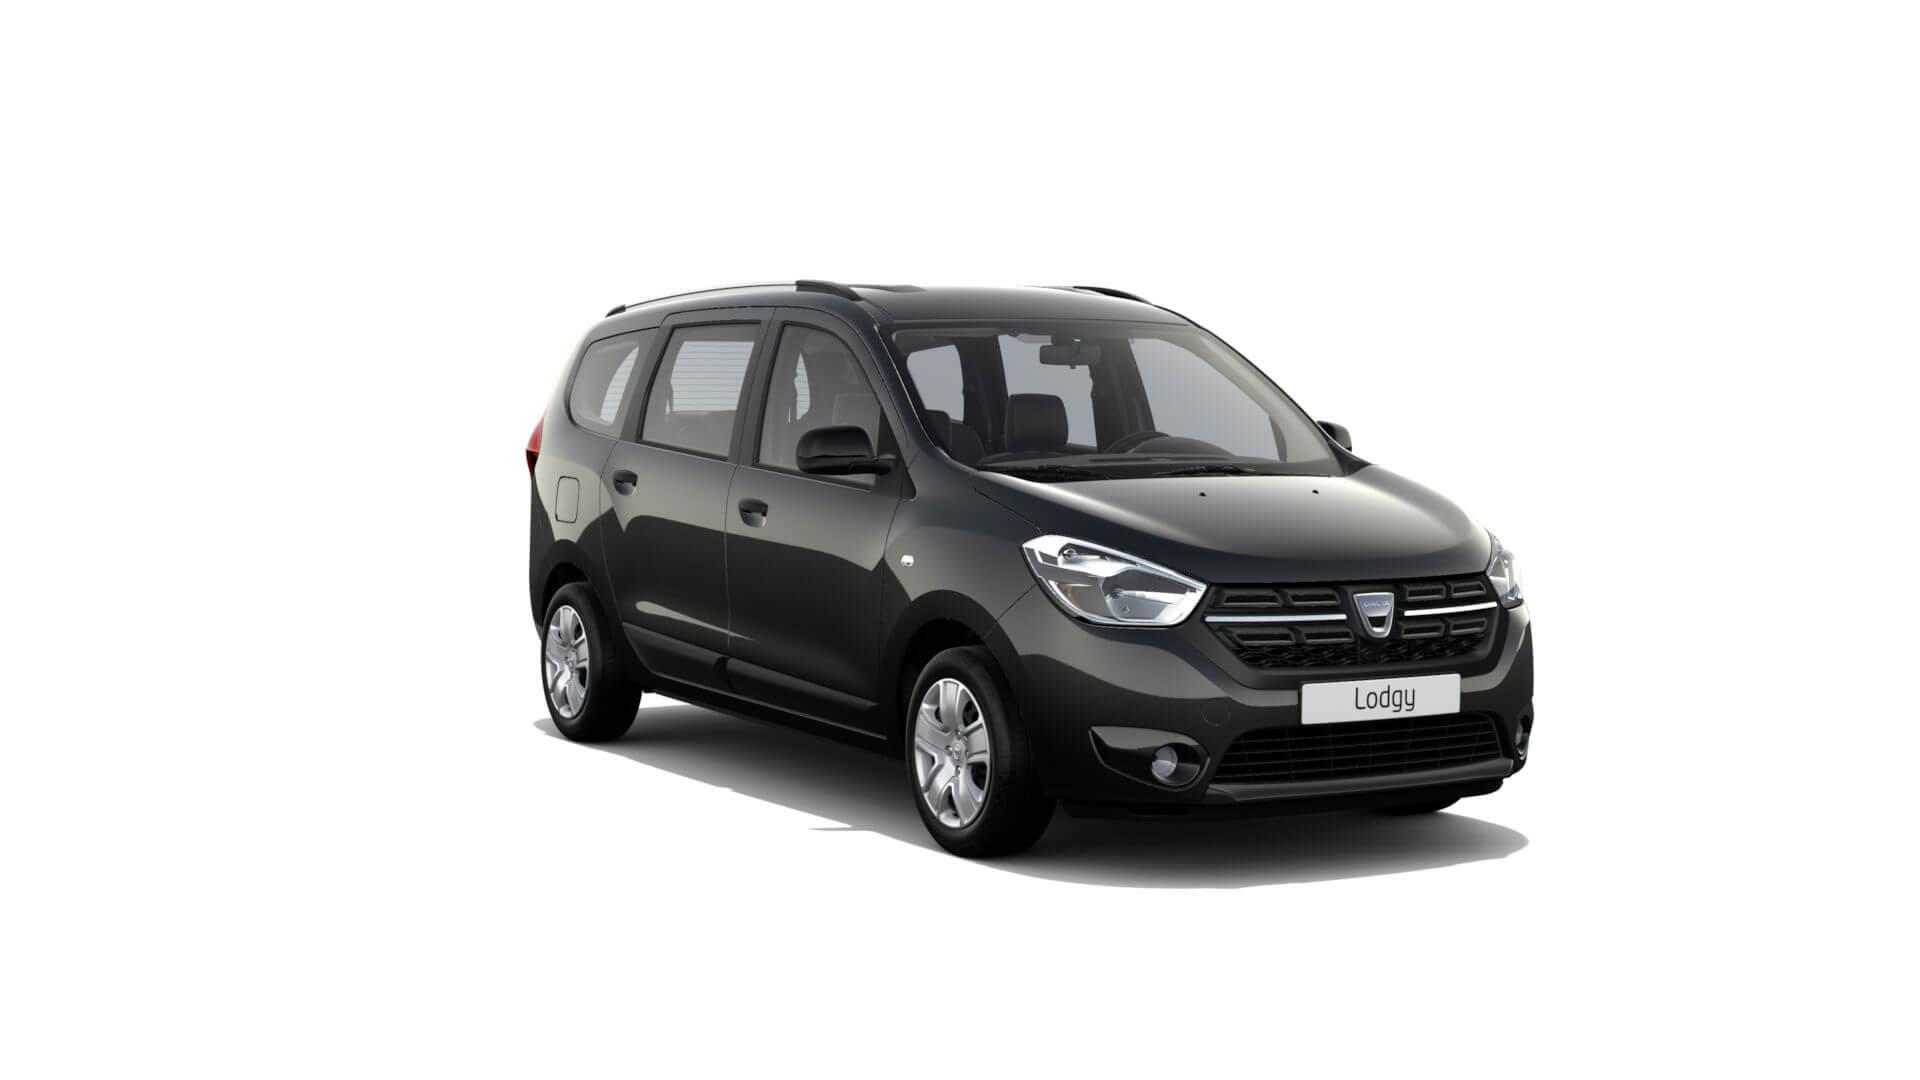 Automodell schwarz - Dacia Lodgy - Renault Ahrens Hannover